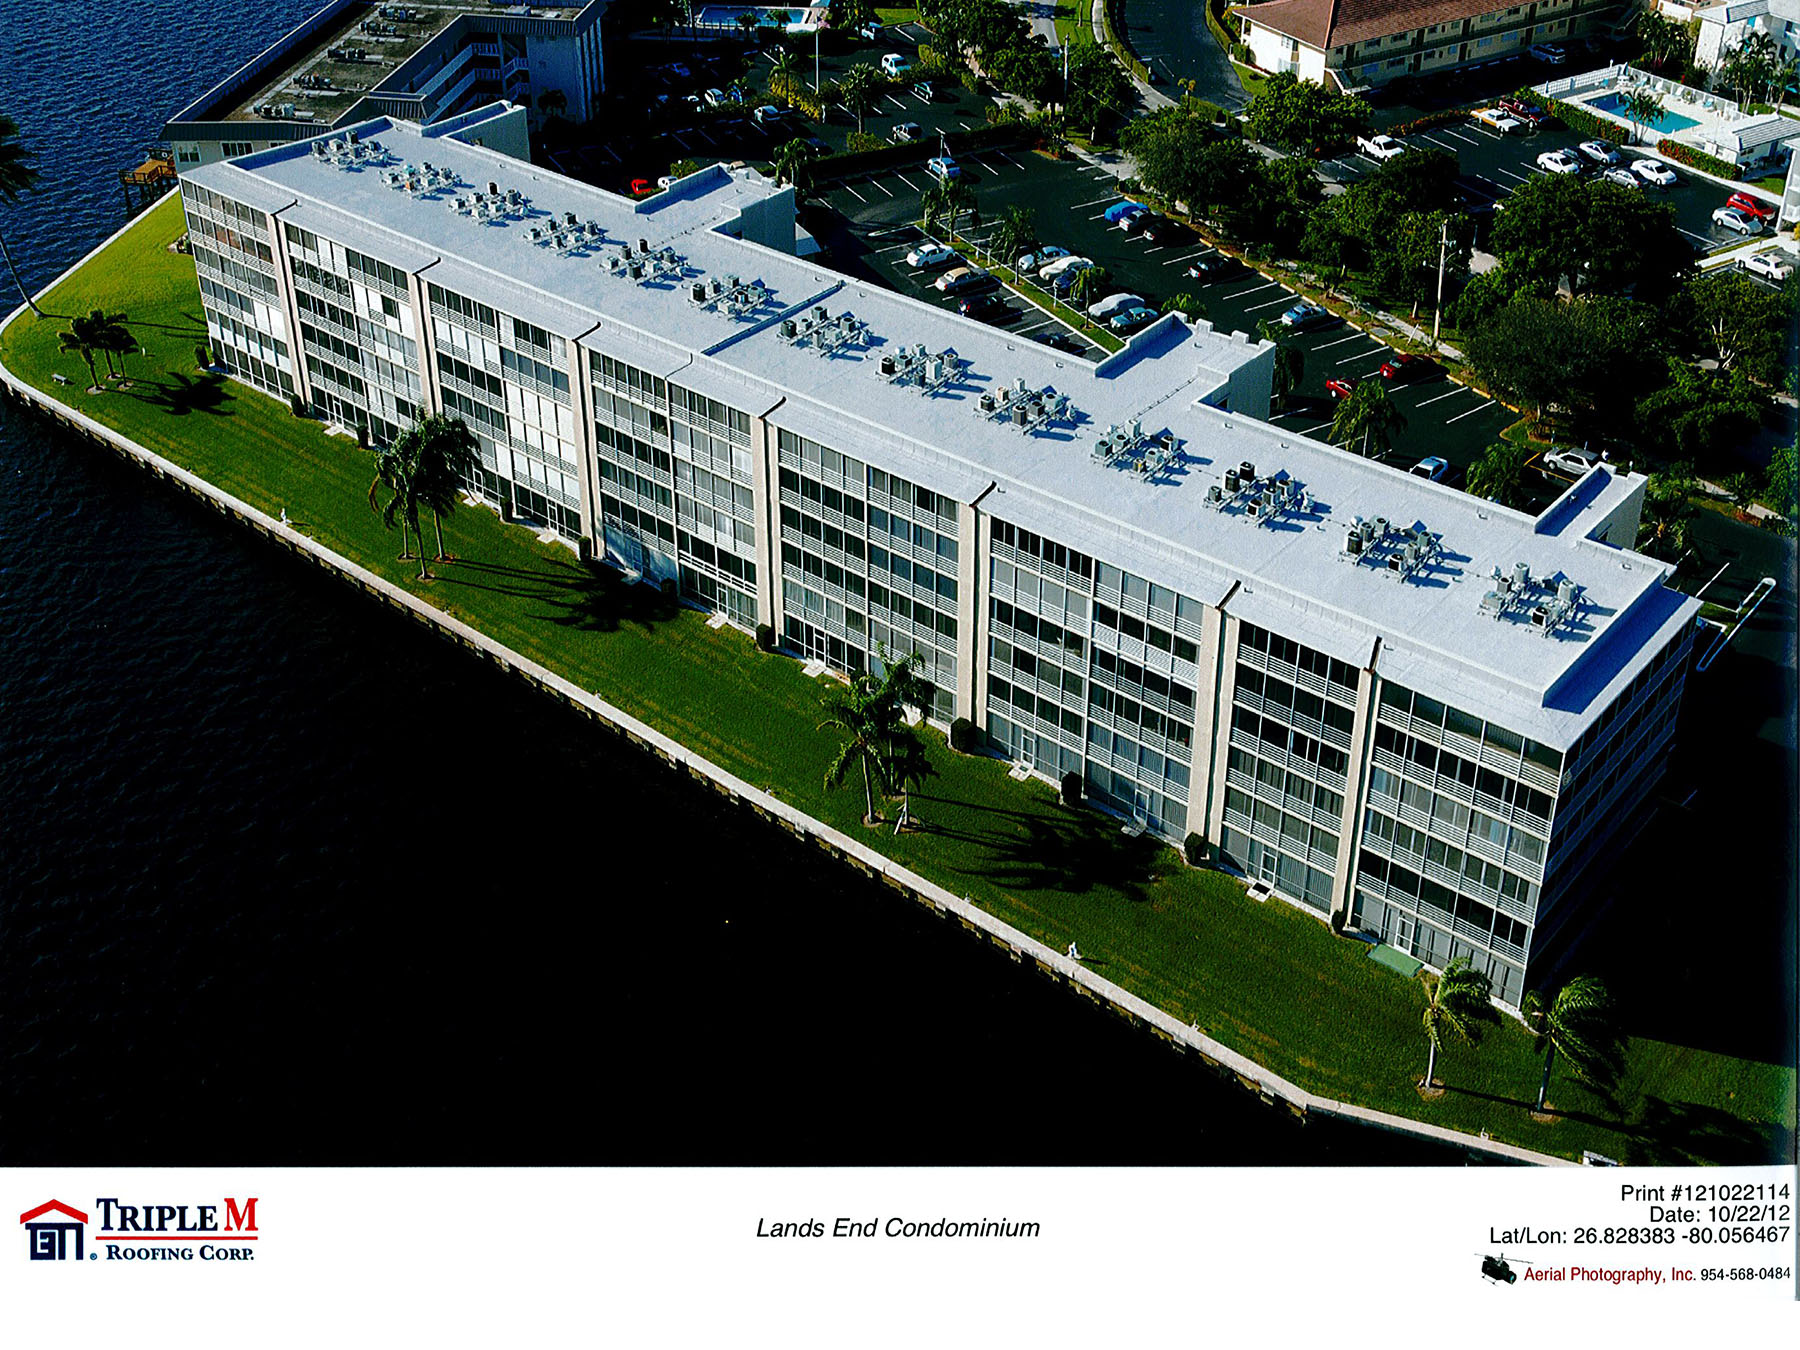 Lands End Condominiums